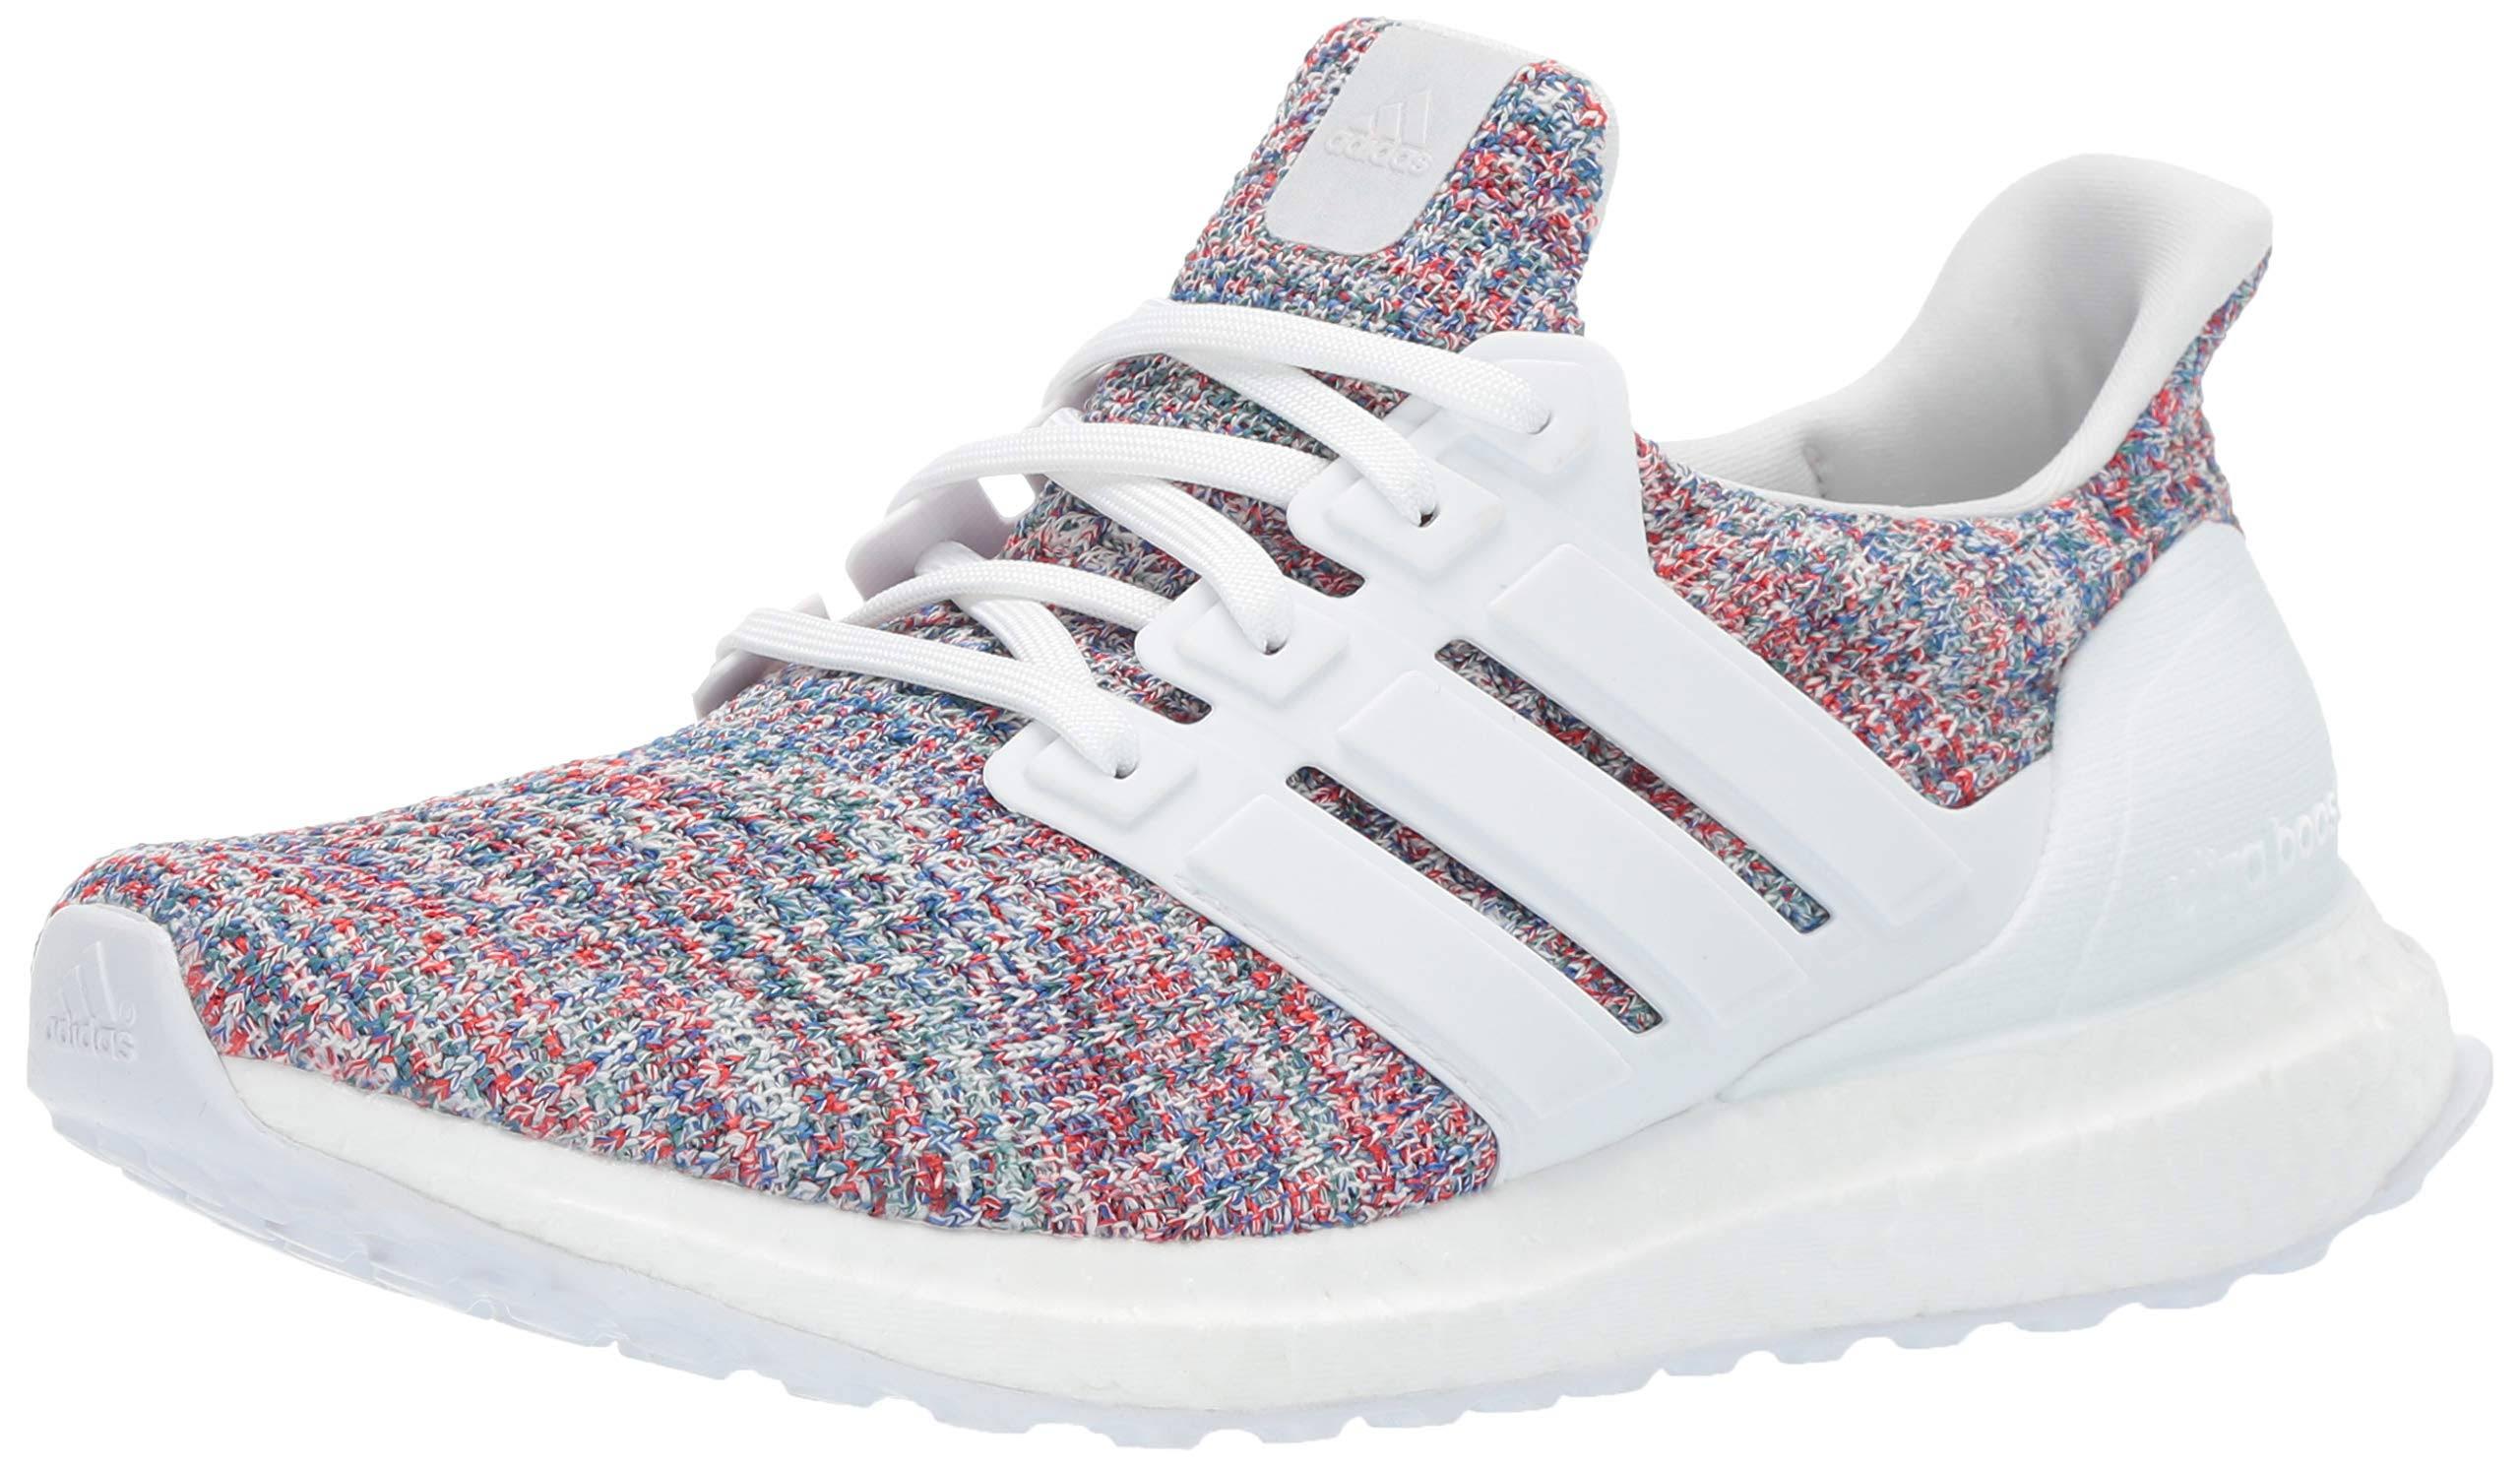 BiancoBlu KidsRunning Ultraboost White 4 Adidas Shoes qUzMjSpLVG